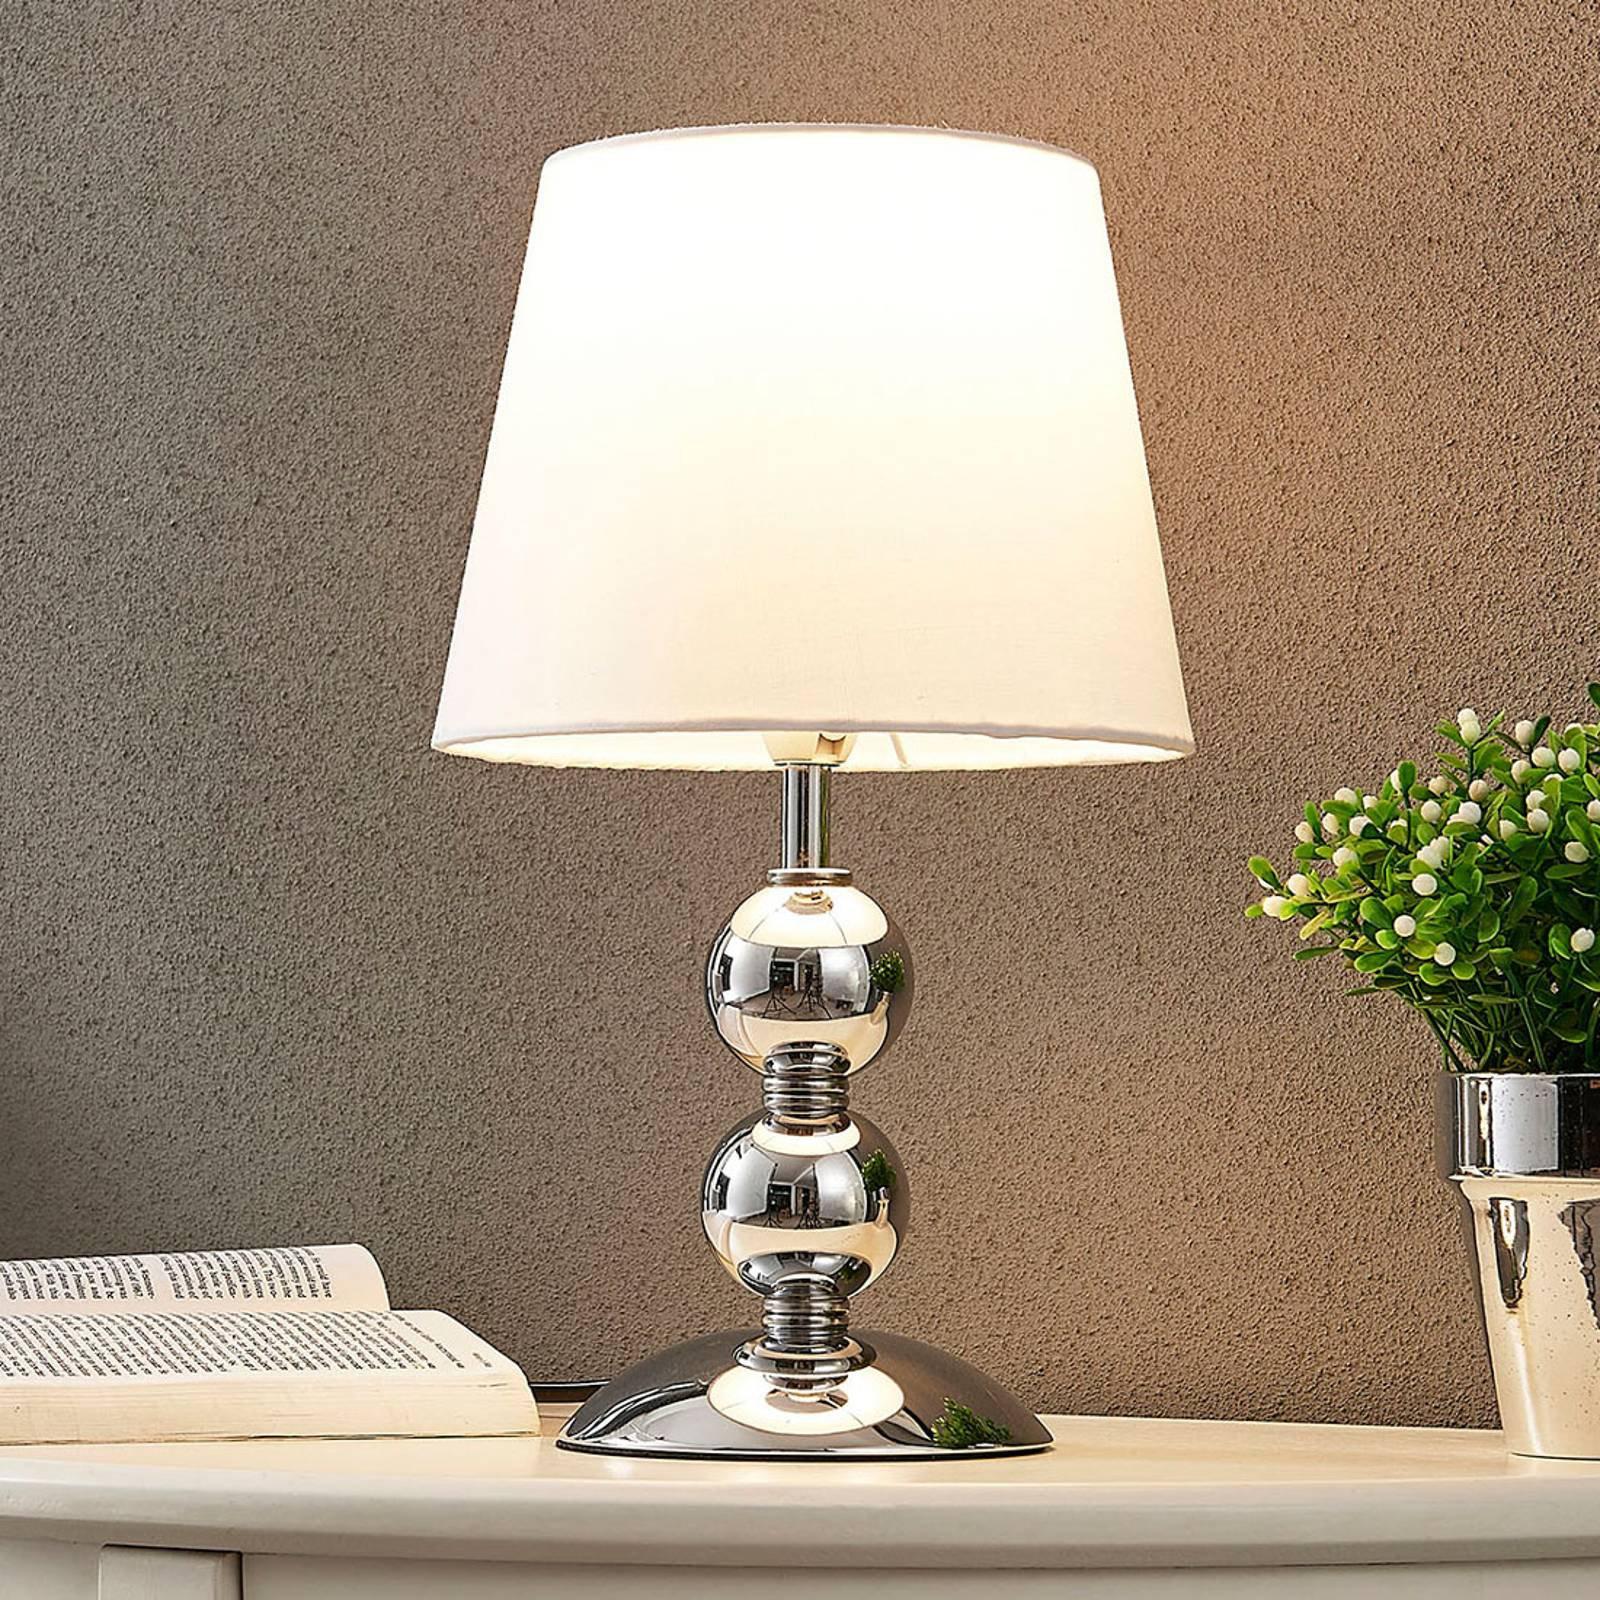 Elegant LED-bordlampe Minna i satengutførelse